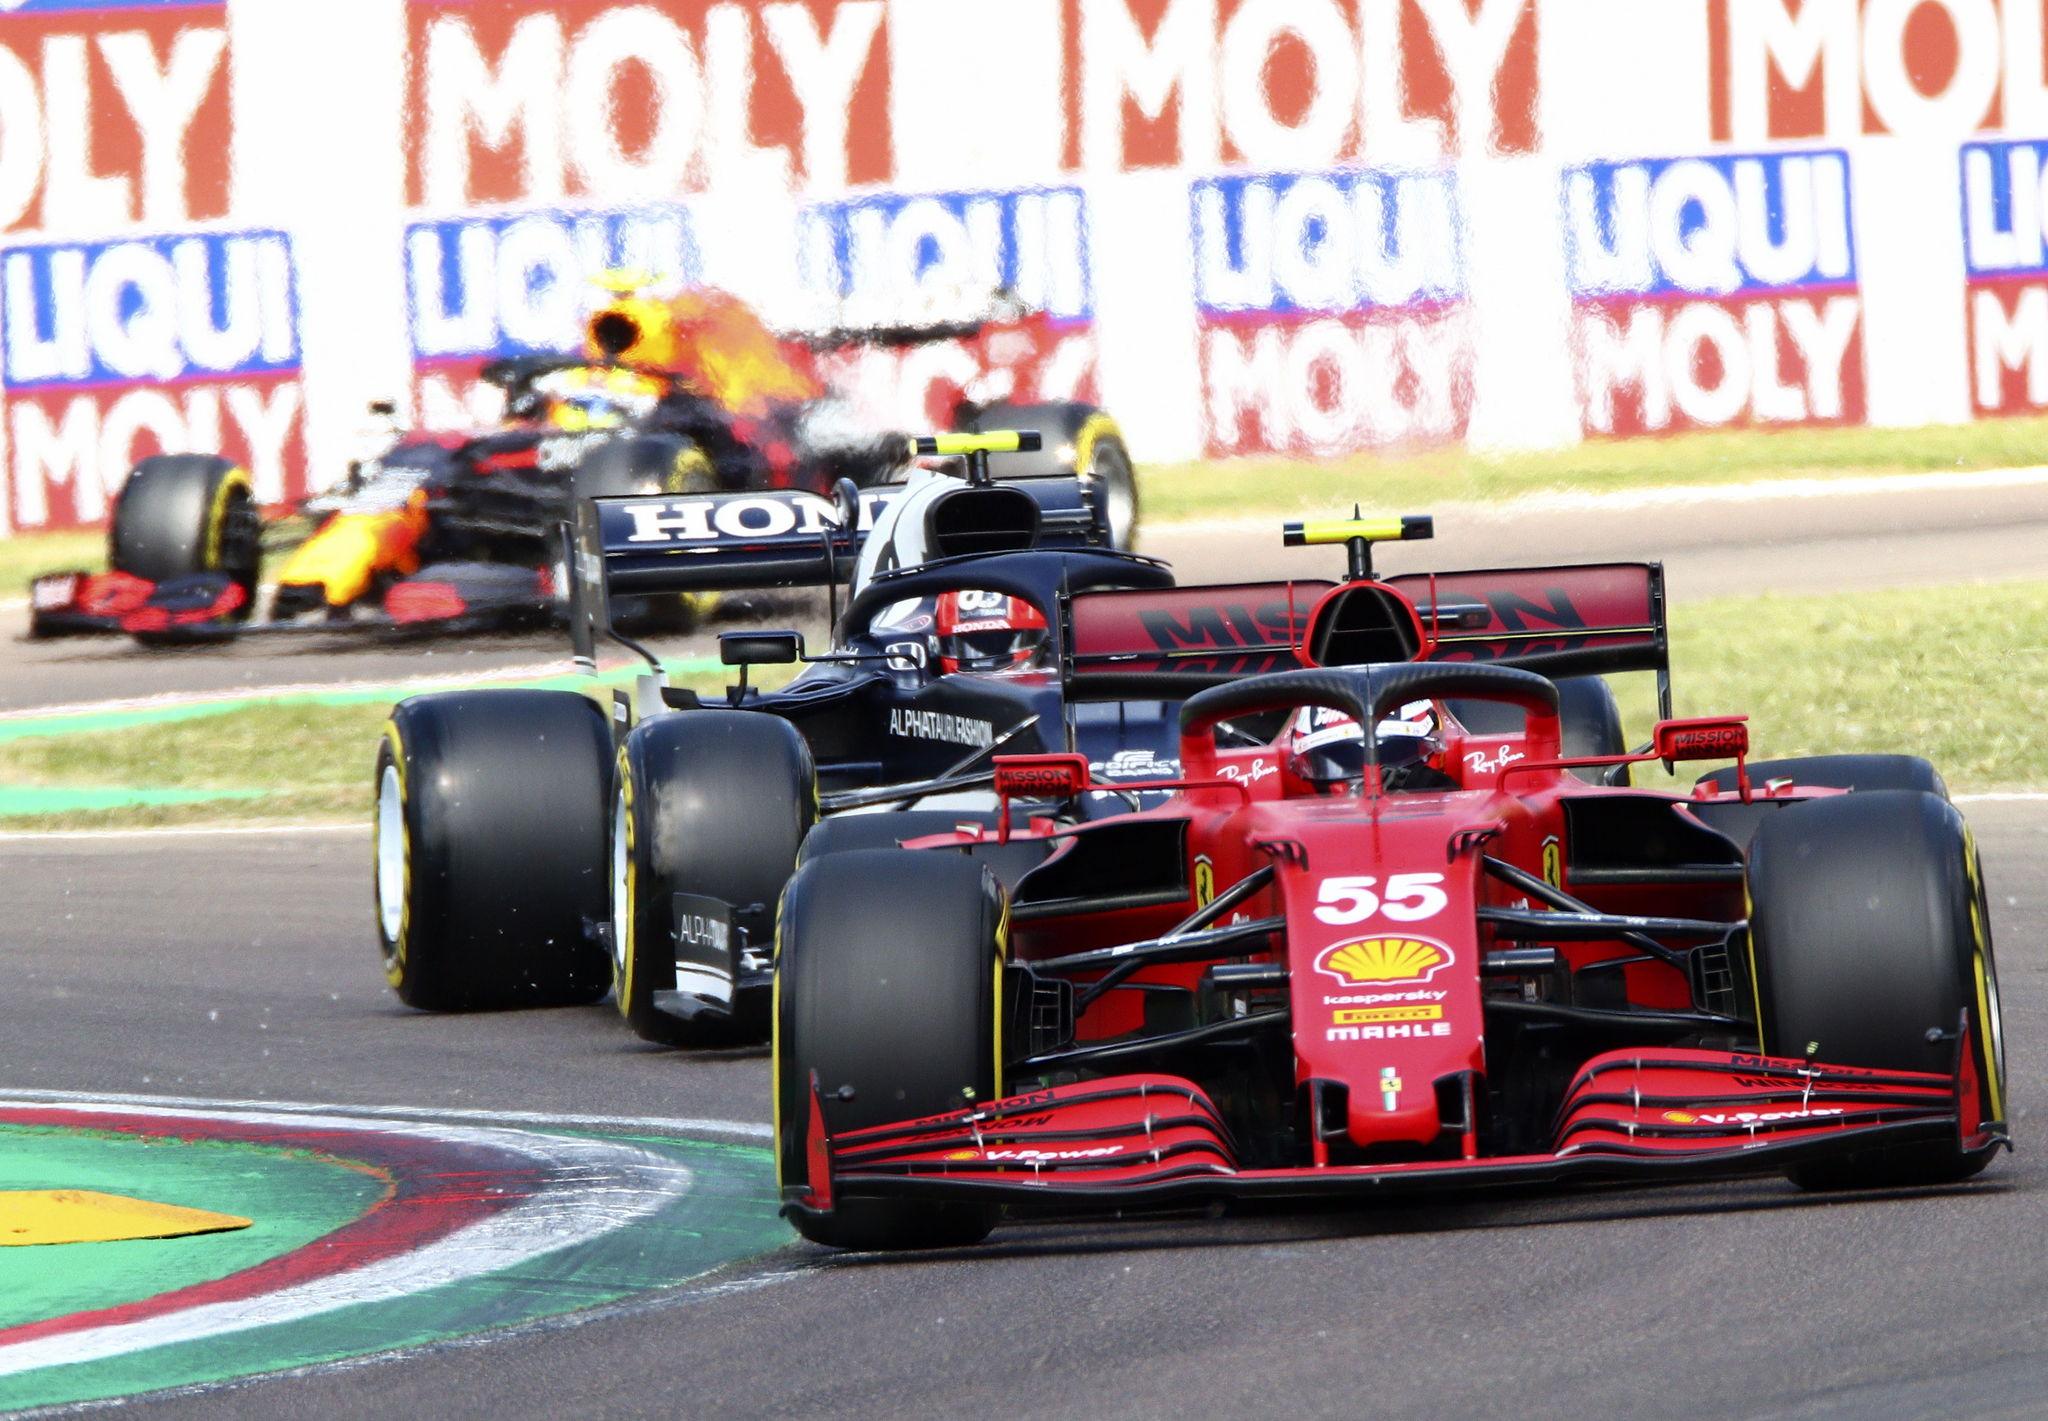 Imola (Italy), 16/04/2021.- Spanish Formula One driver lt;HIT gt;Carlos lt;/HIT gt; lt;HIT gt;Sainz lt;/HIT gt; (front) of Scuderia Ferrari Mission Winnow in action during the second practice session of the Formula One Grand Prix Emilia Romagna at Imola race track, Italy, 16 April 2021. The Formula One Grand Prix Emilia Romagna will take place on 18 April 2021. (Fórmula Uno, Italia) EFE/EPA/DAVIDE GENNARI